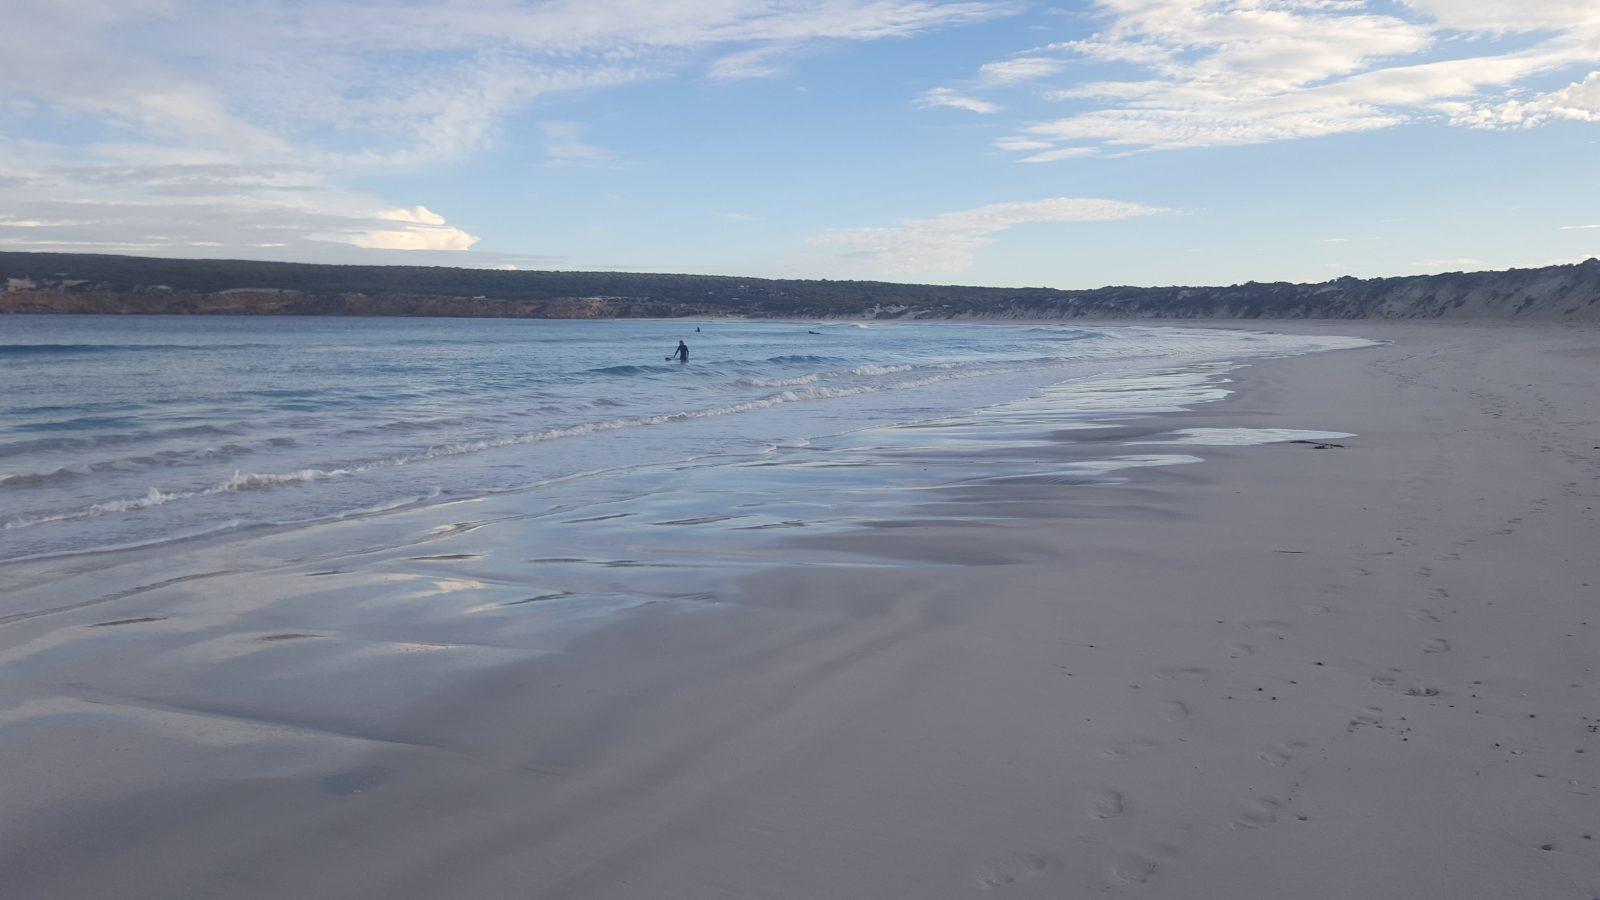 Surfeurs Fishery Bay